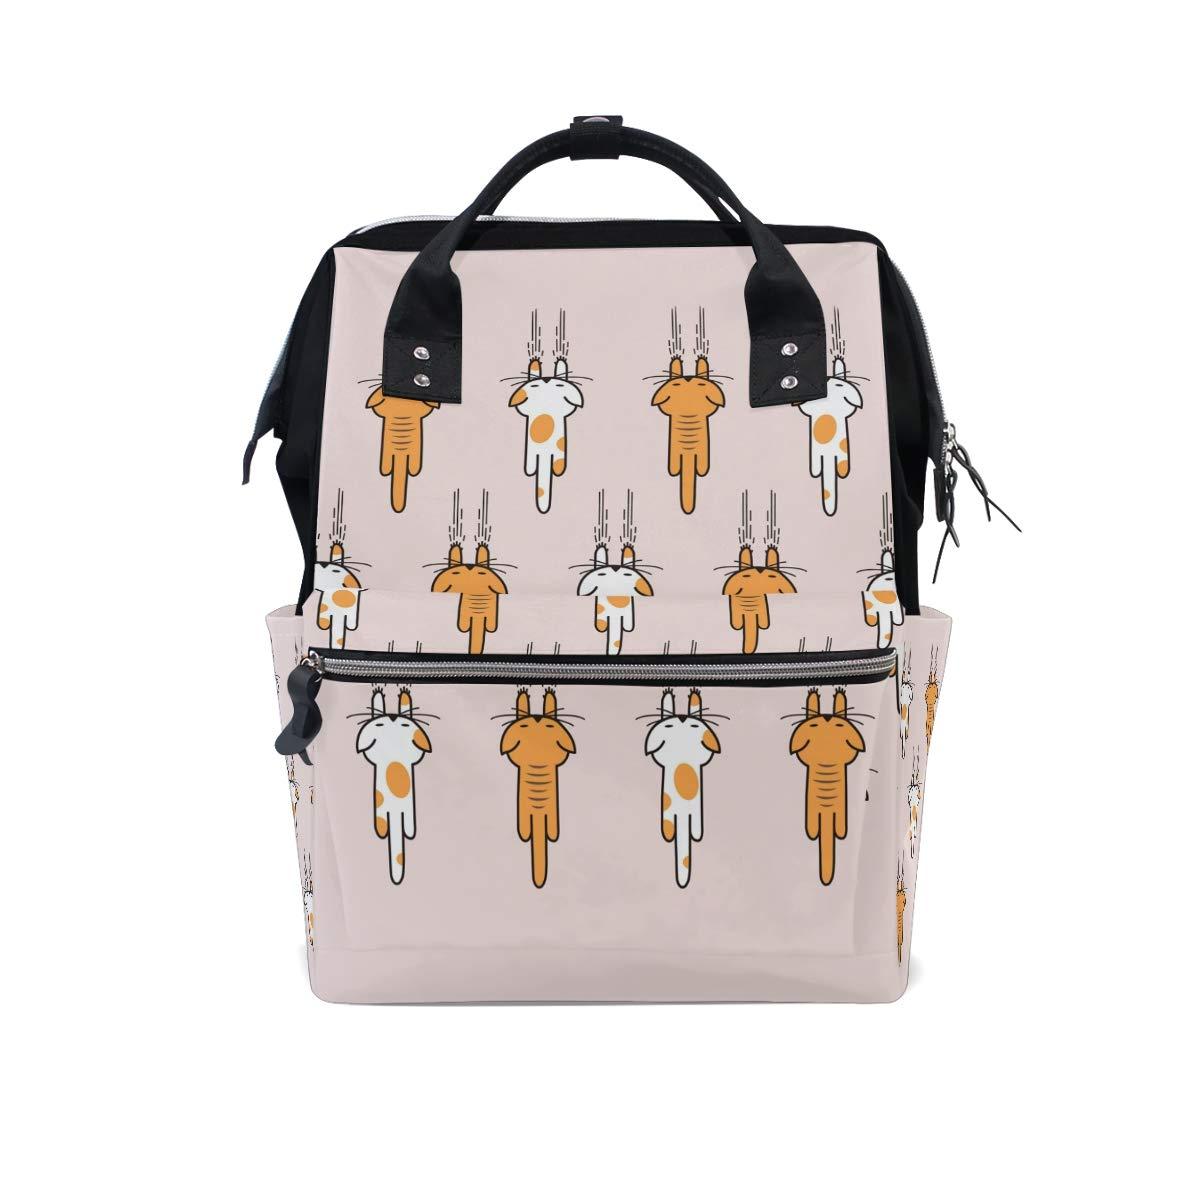 MERRYSUGAR Diaper Bag Backpack Cute Cats Kitten Animal Baby Bag School Backpack Mommy Bag Large Multifunction Travel Bag